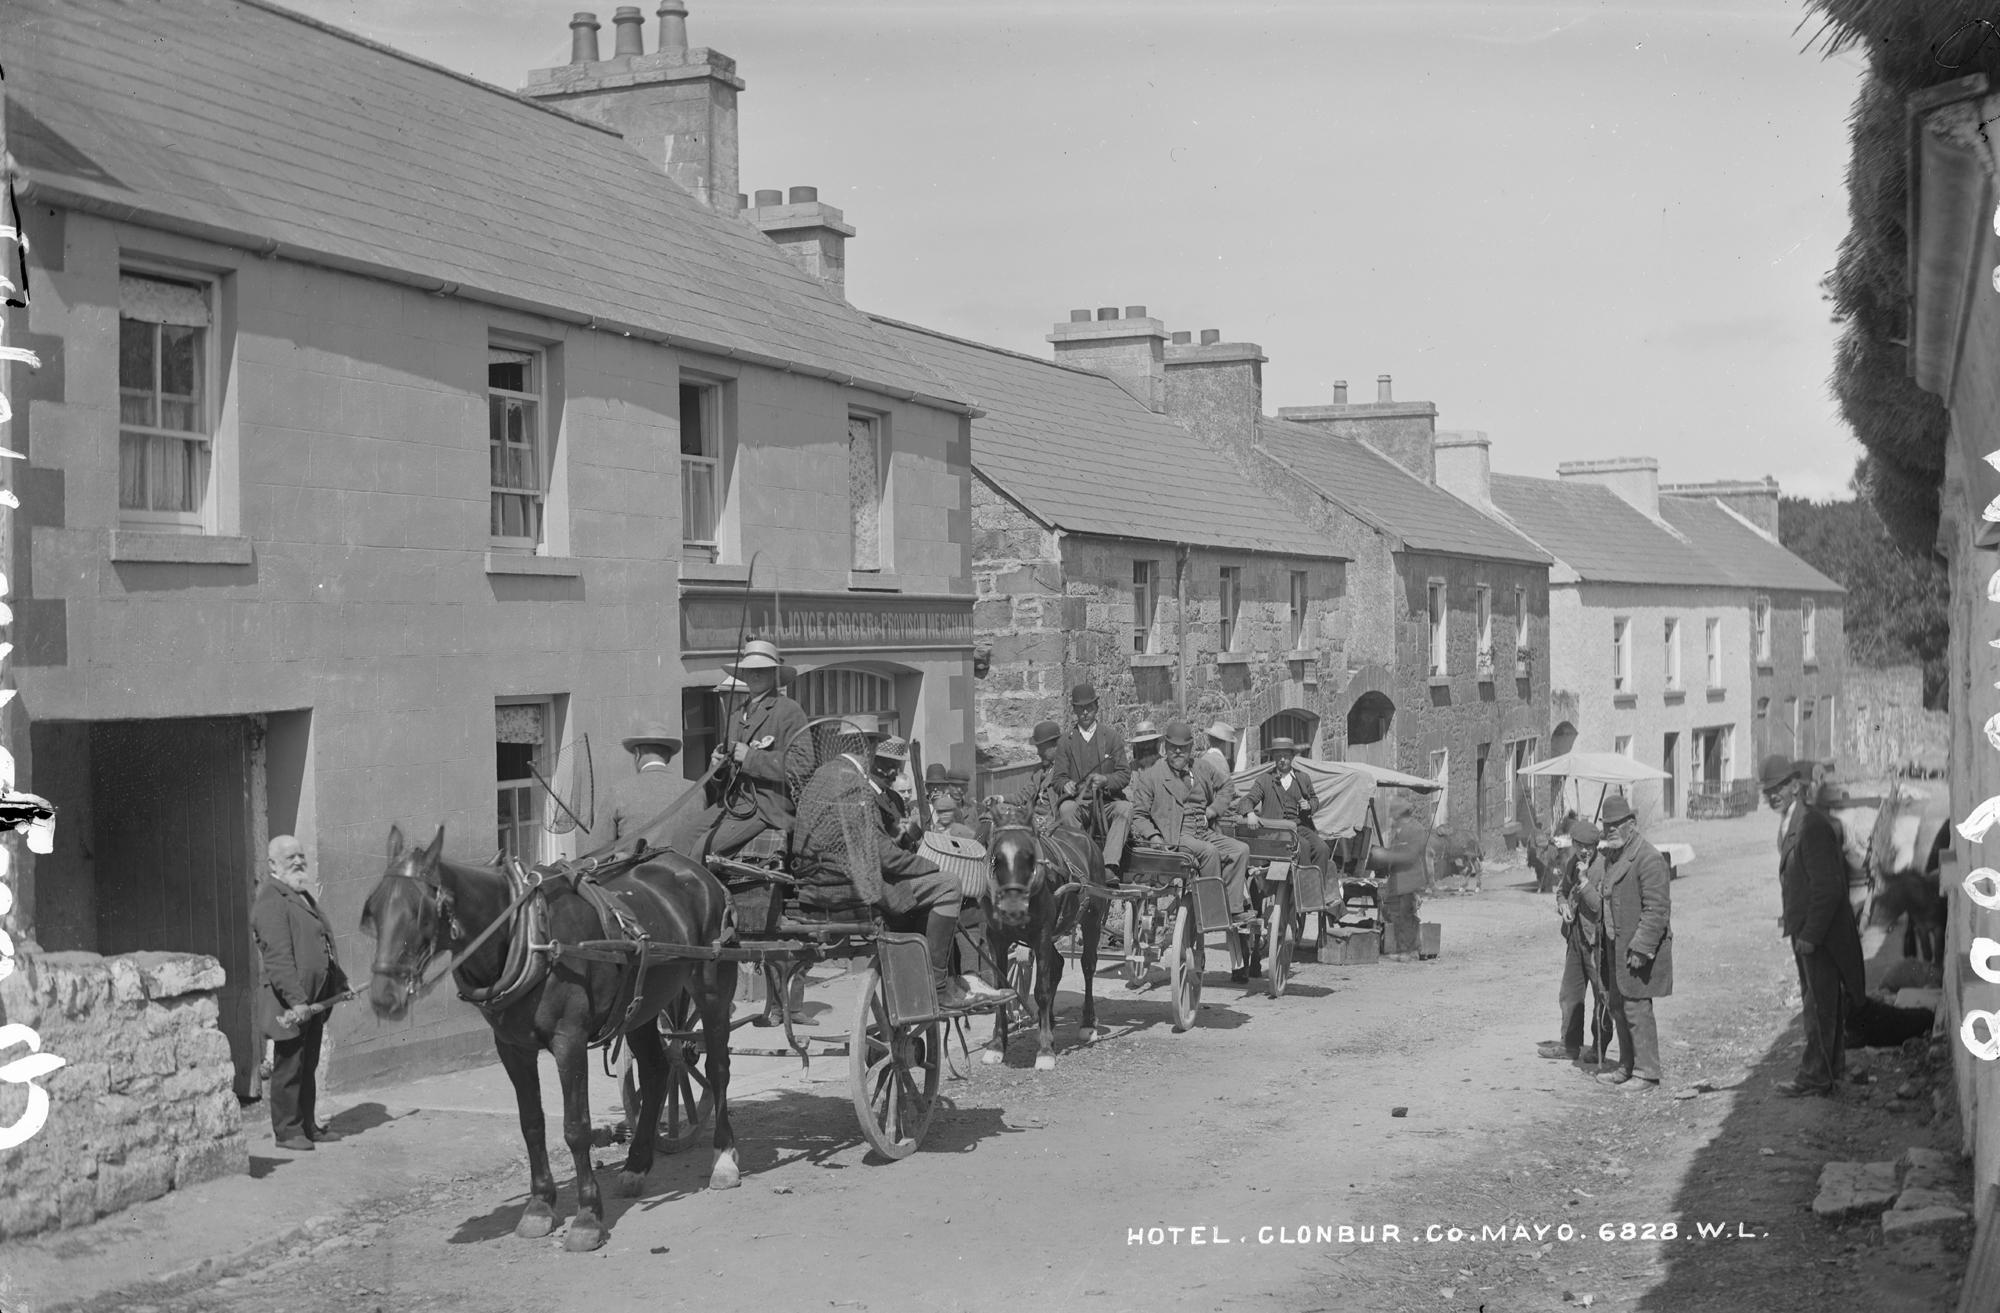 Hotel, Clonbur, Co Galway